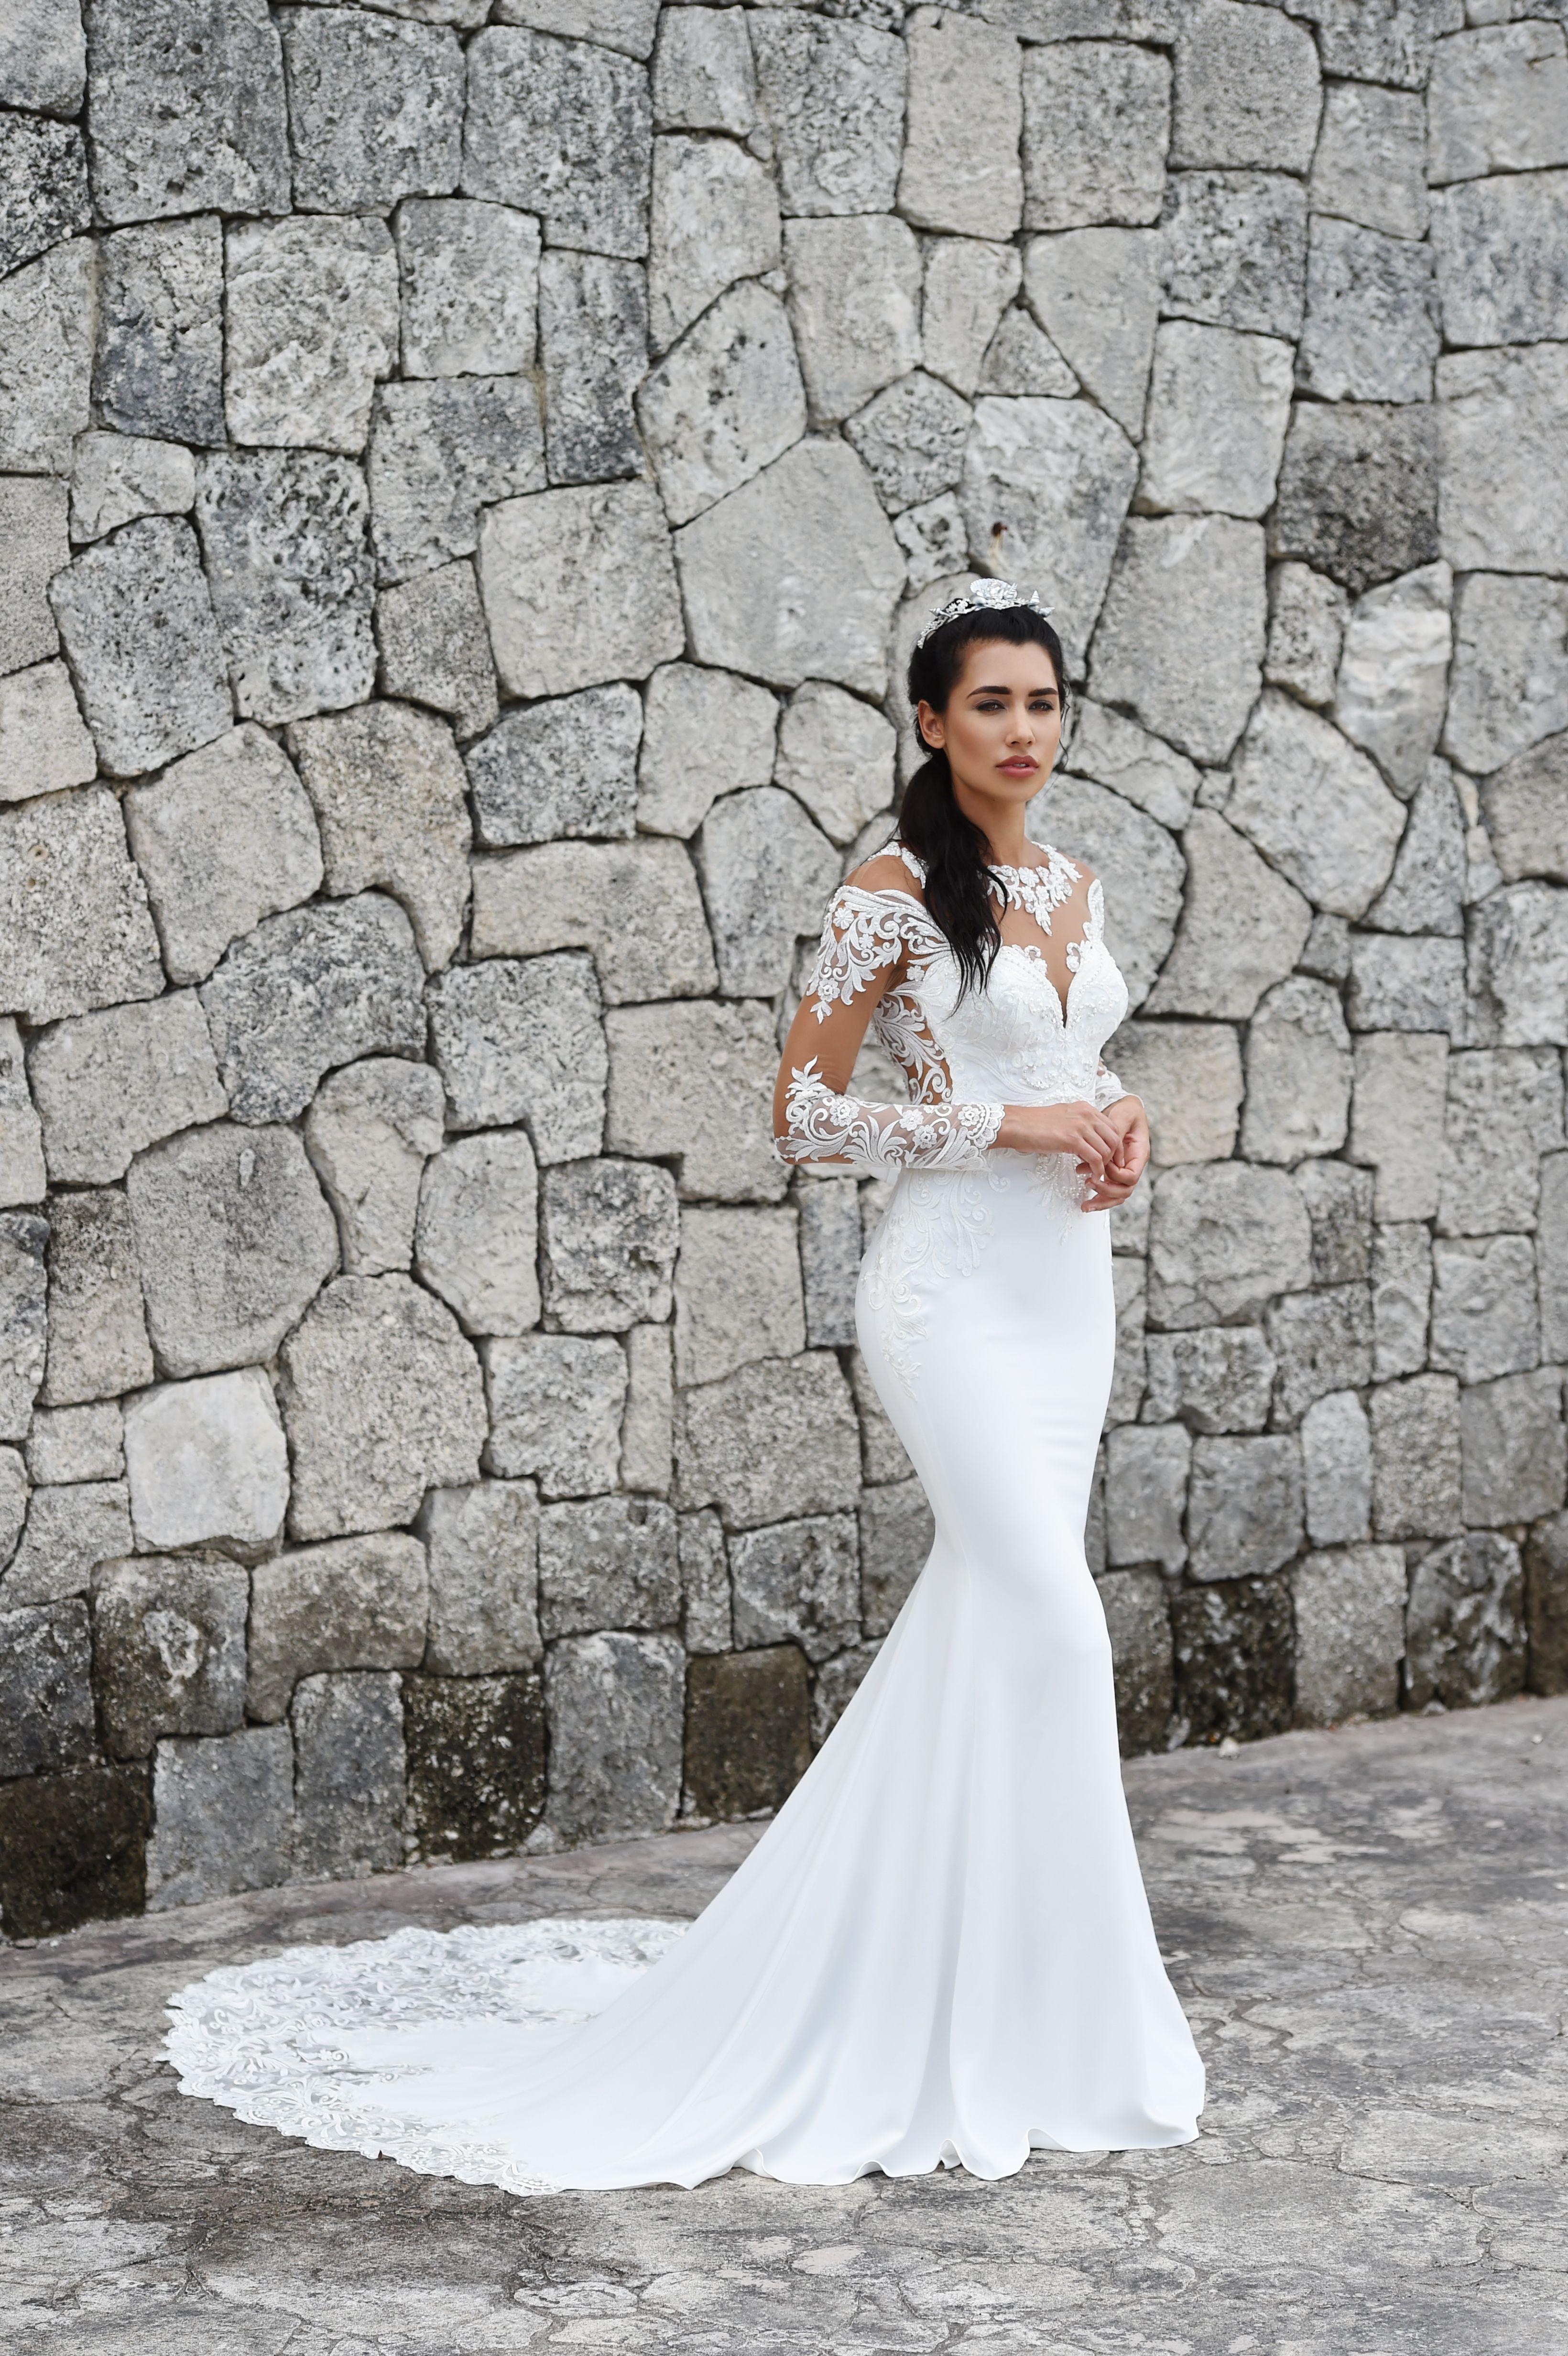 f26995da927e Dando London Signature 2018 bridal gown collection . Hyde Park - Column  style gown with illusion lace neckline and back